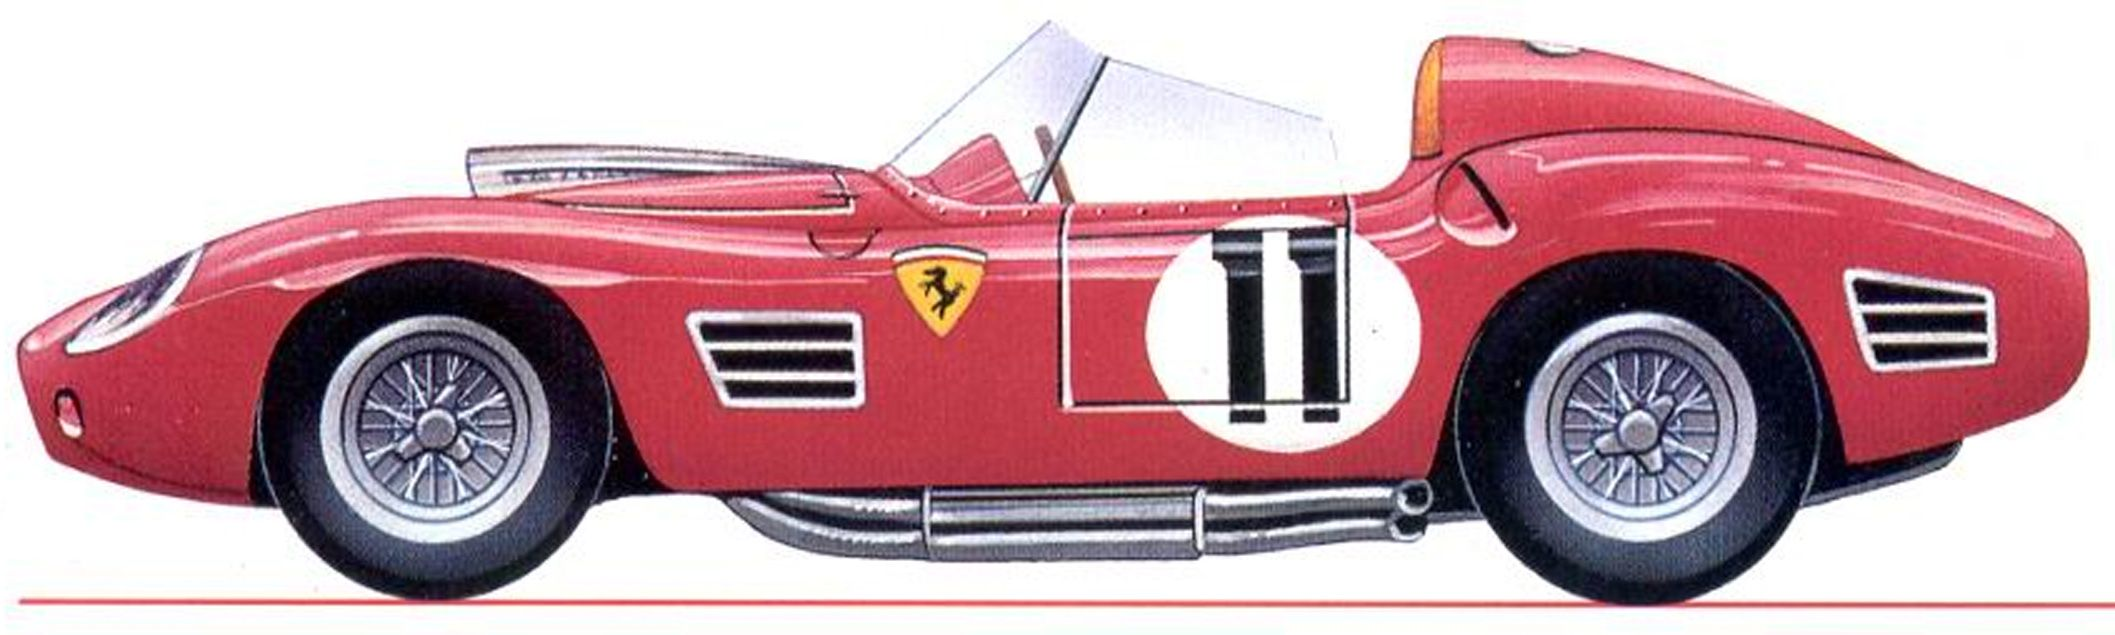 Ferrari 250 testa rossa 1960 car side views pinterest ferrari 250 testa rossa 1960 vanachro Gallery